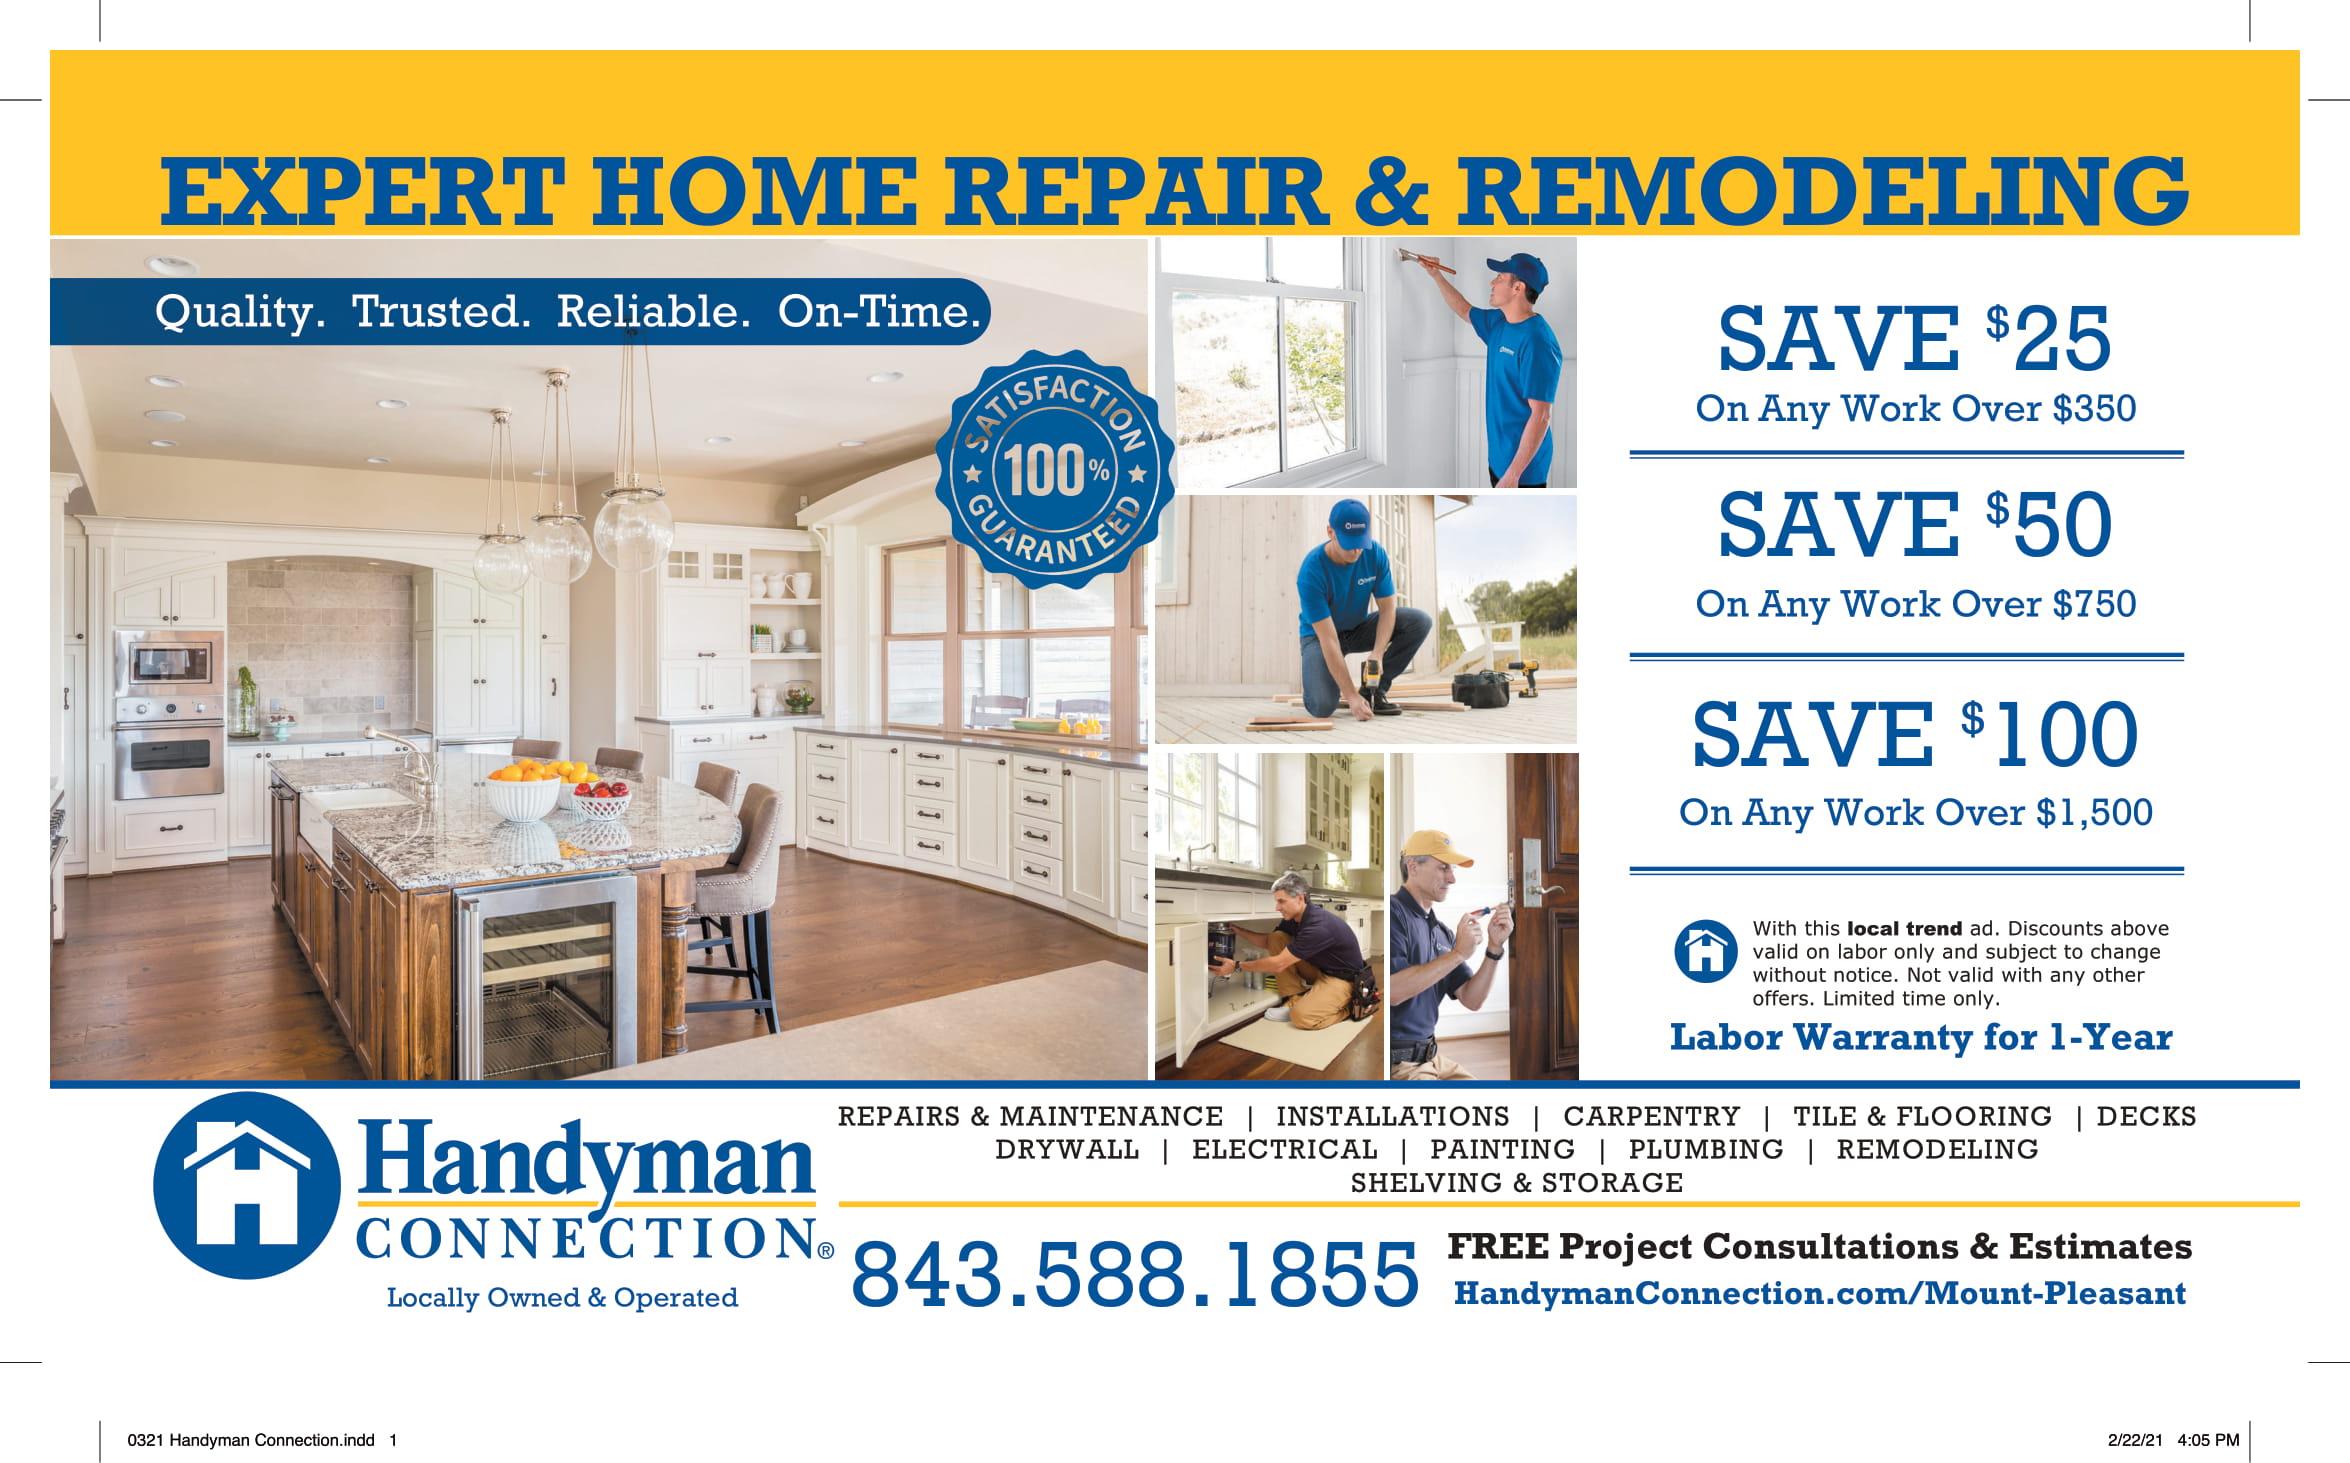 0321 Handyman Connection 1